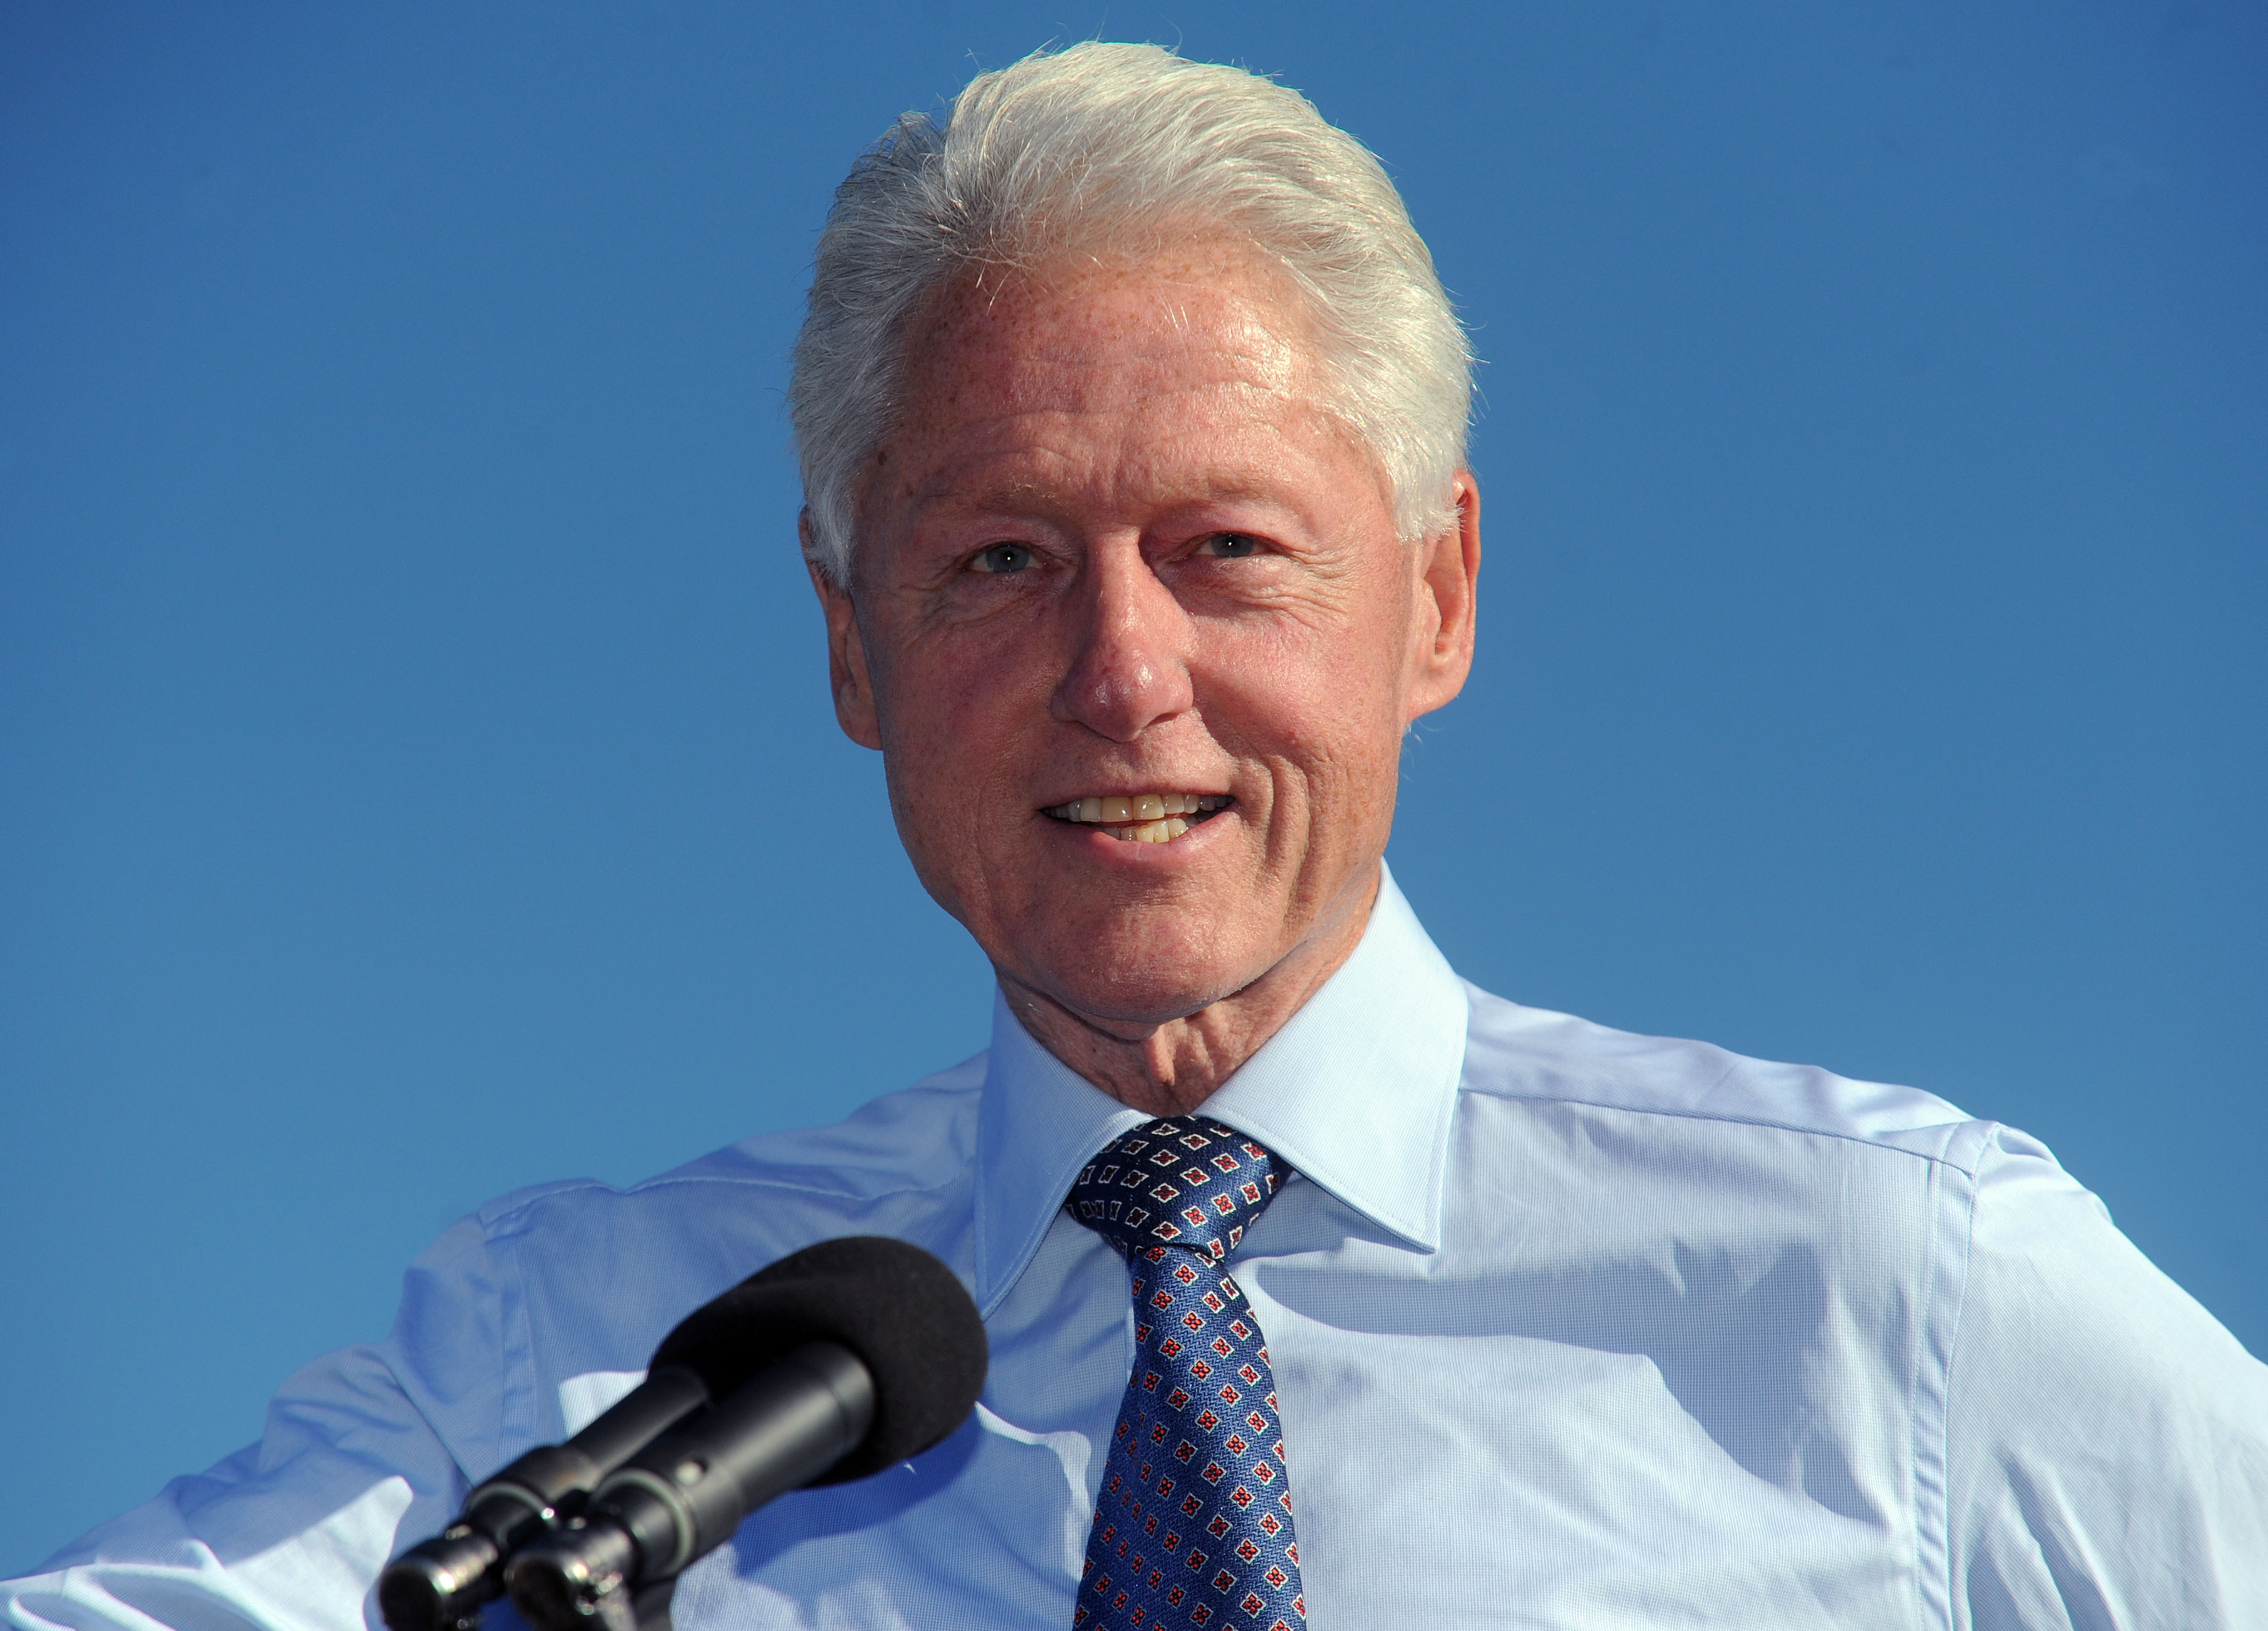 Bill Clinton Wallpaper For Computer